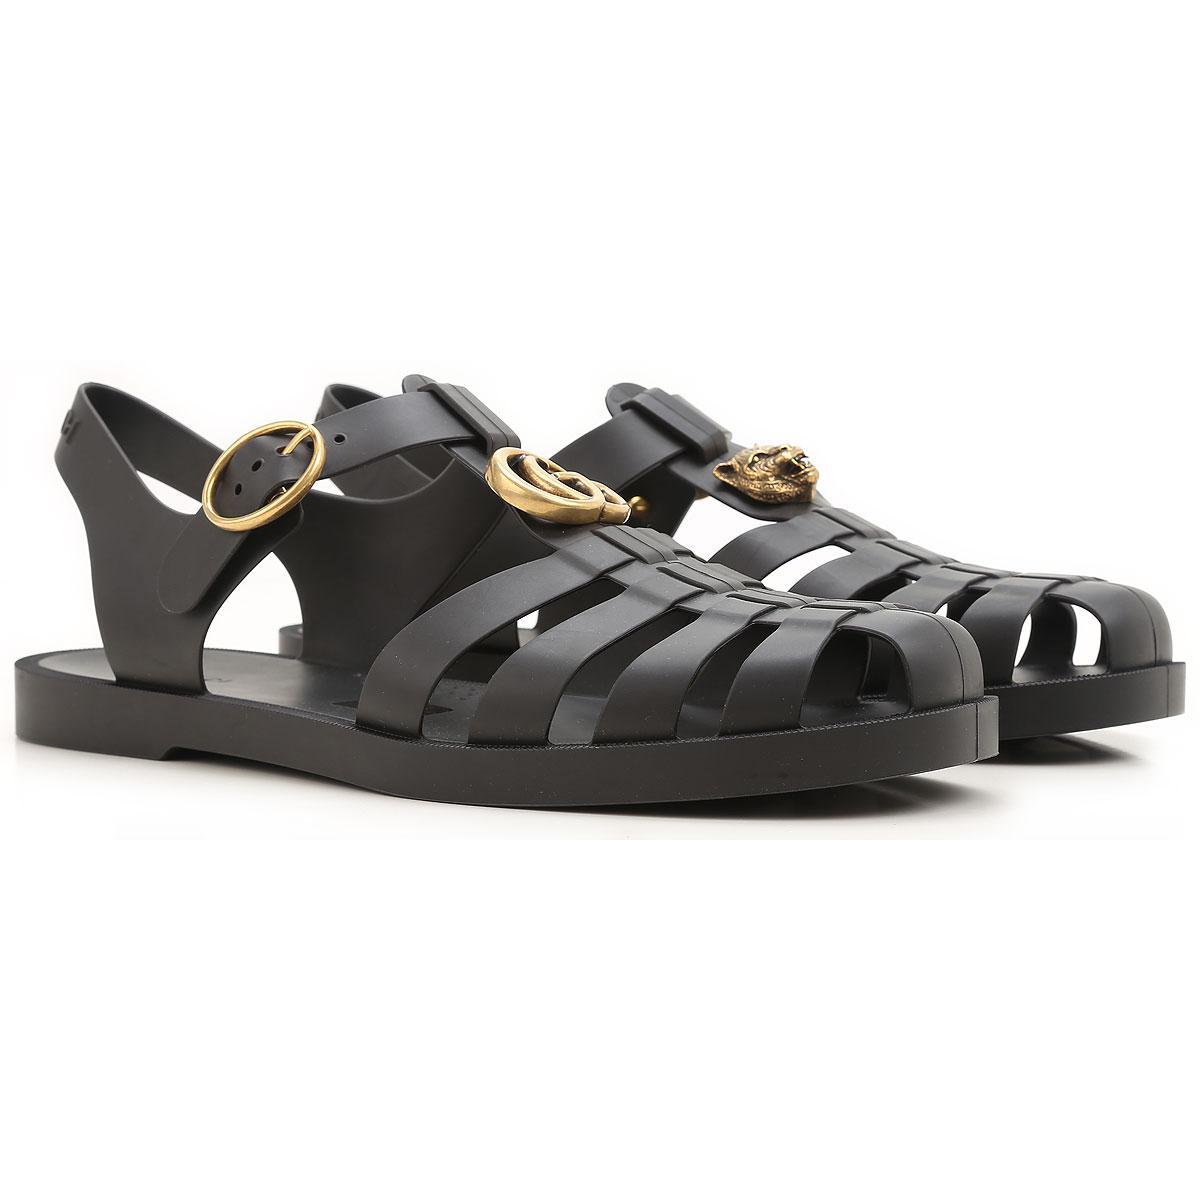 d744147cf Gucci Shoes For Men in Black for Men - Lyst